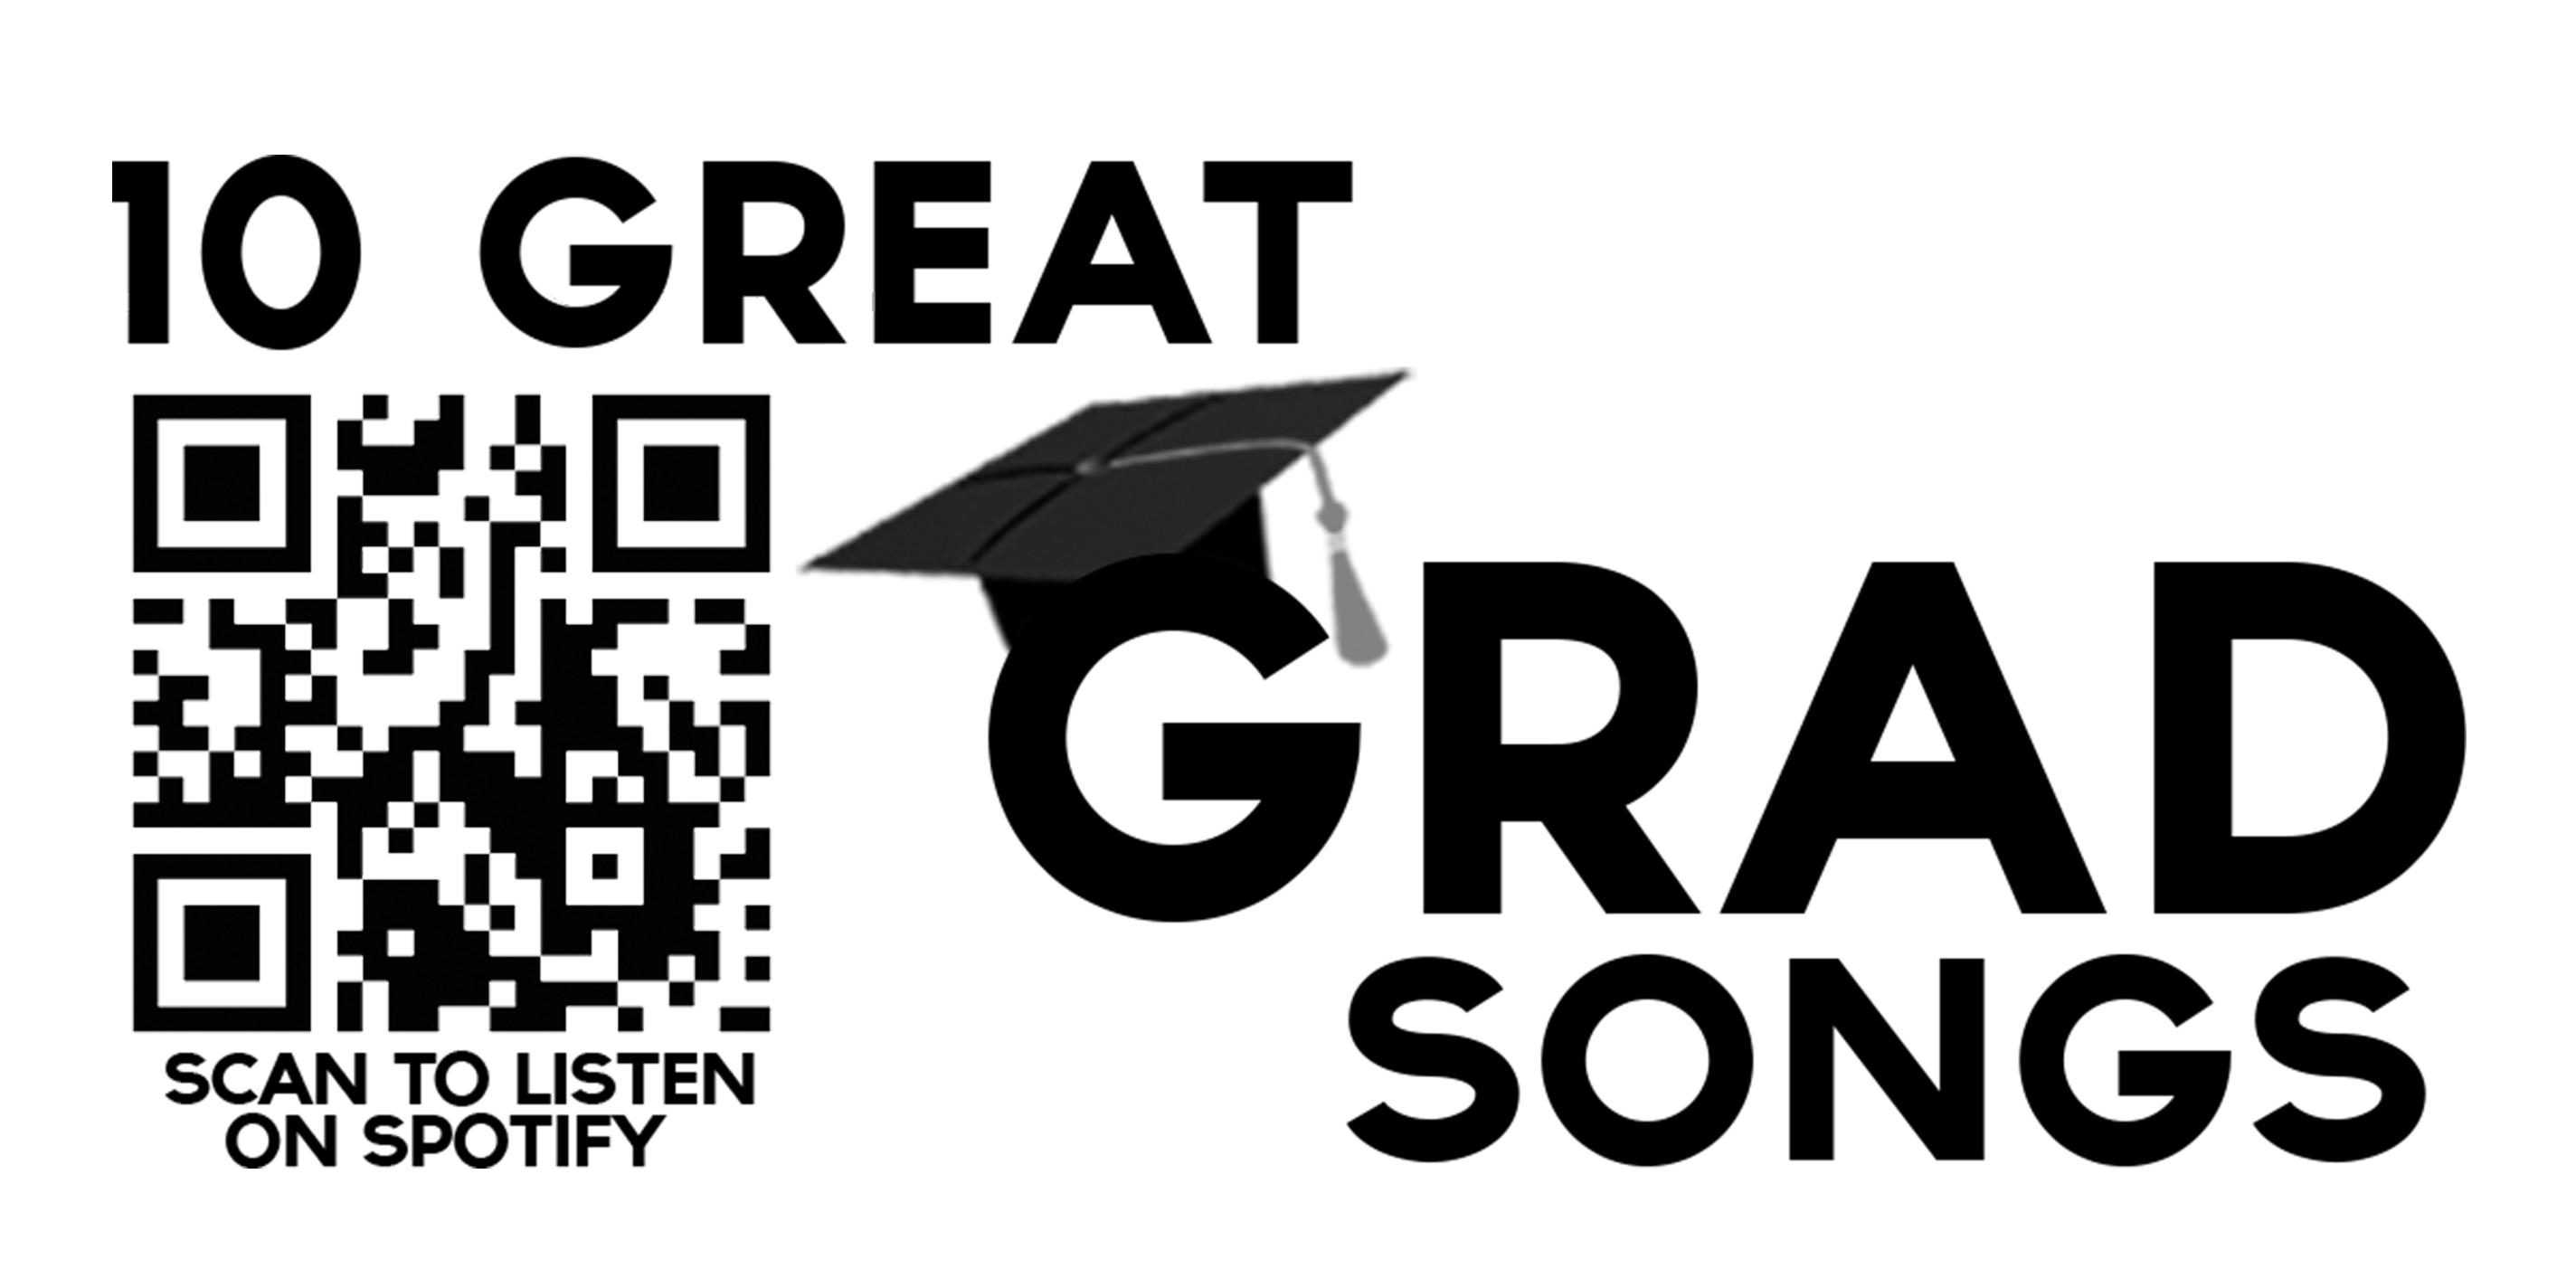 10 Great Grad Songs / M. Pichola